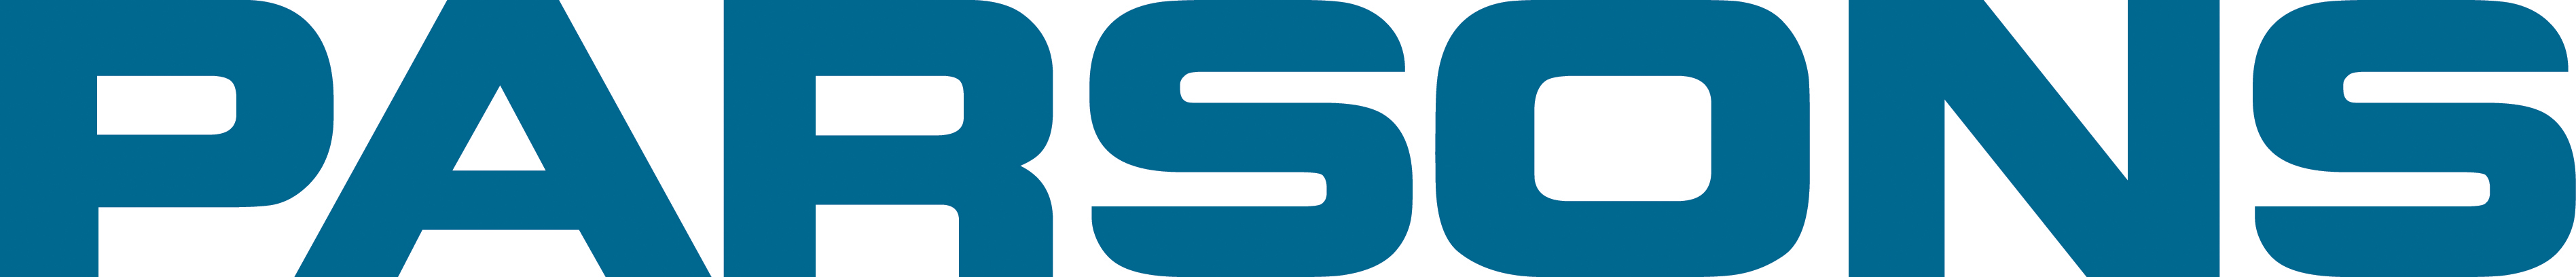 Parsons Logos.